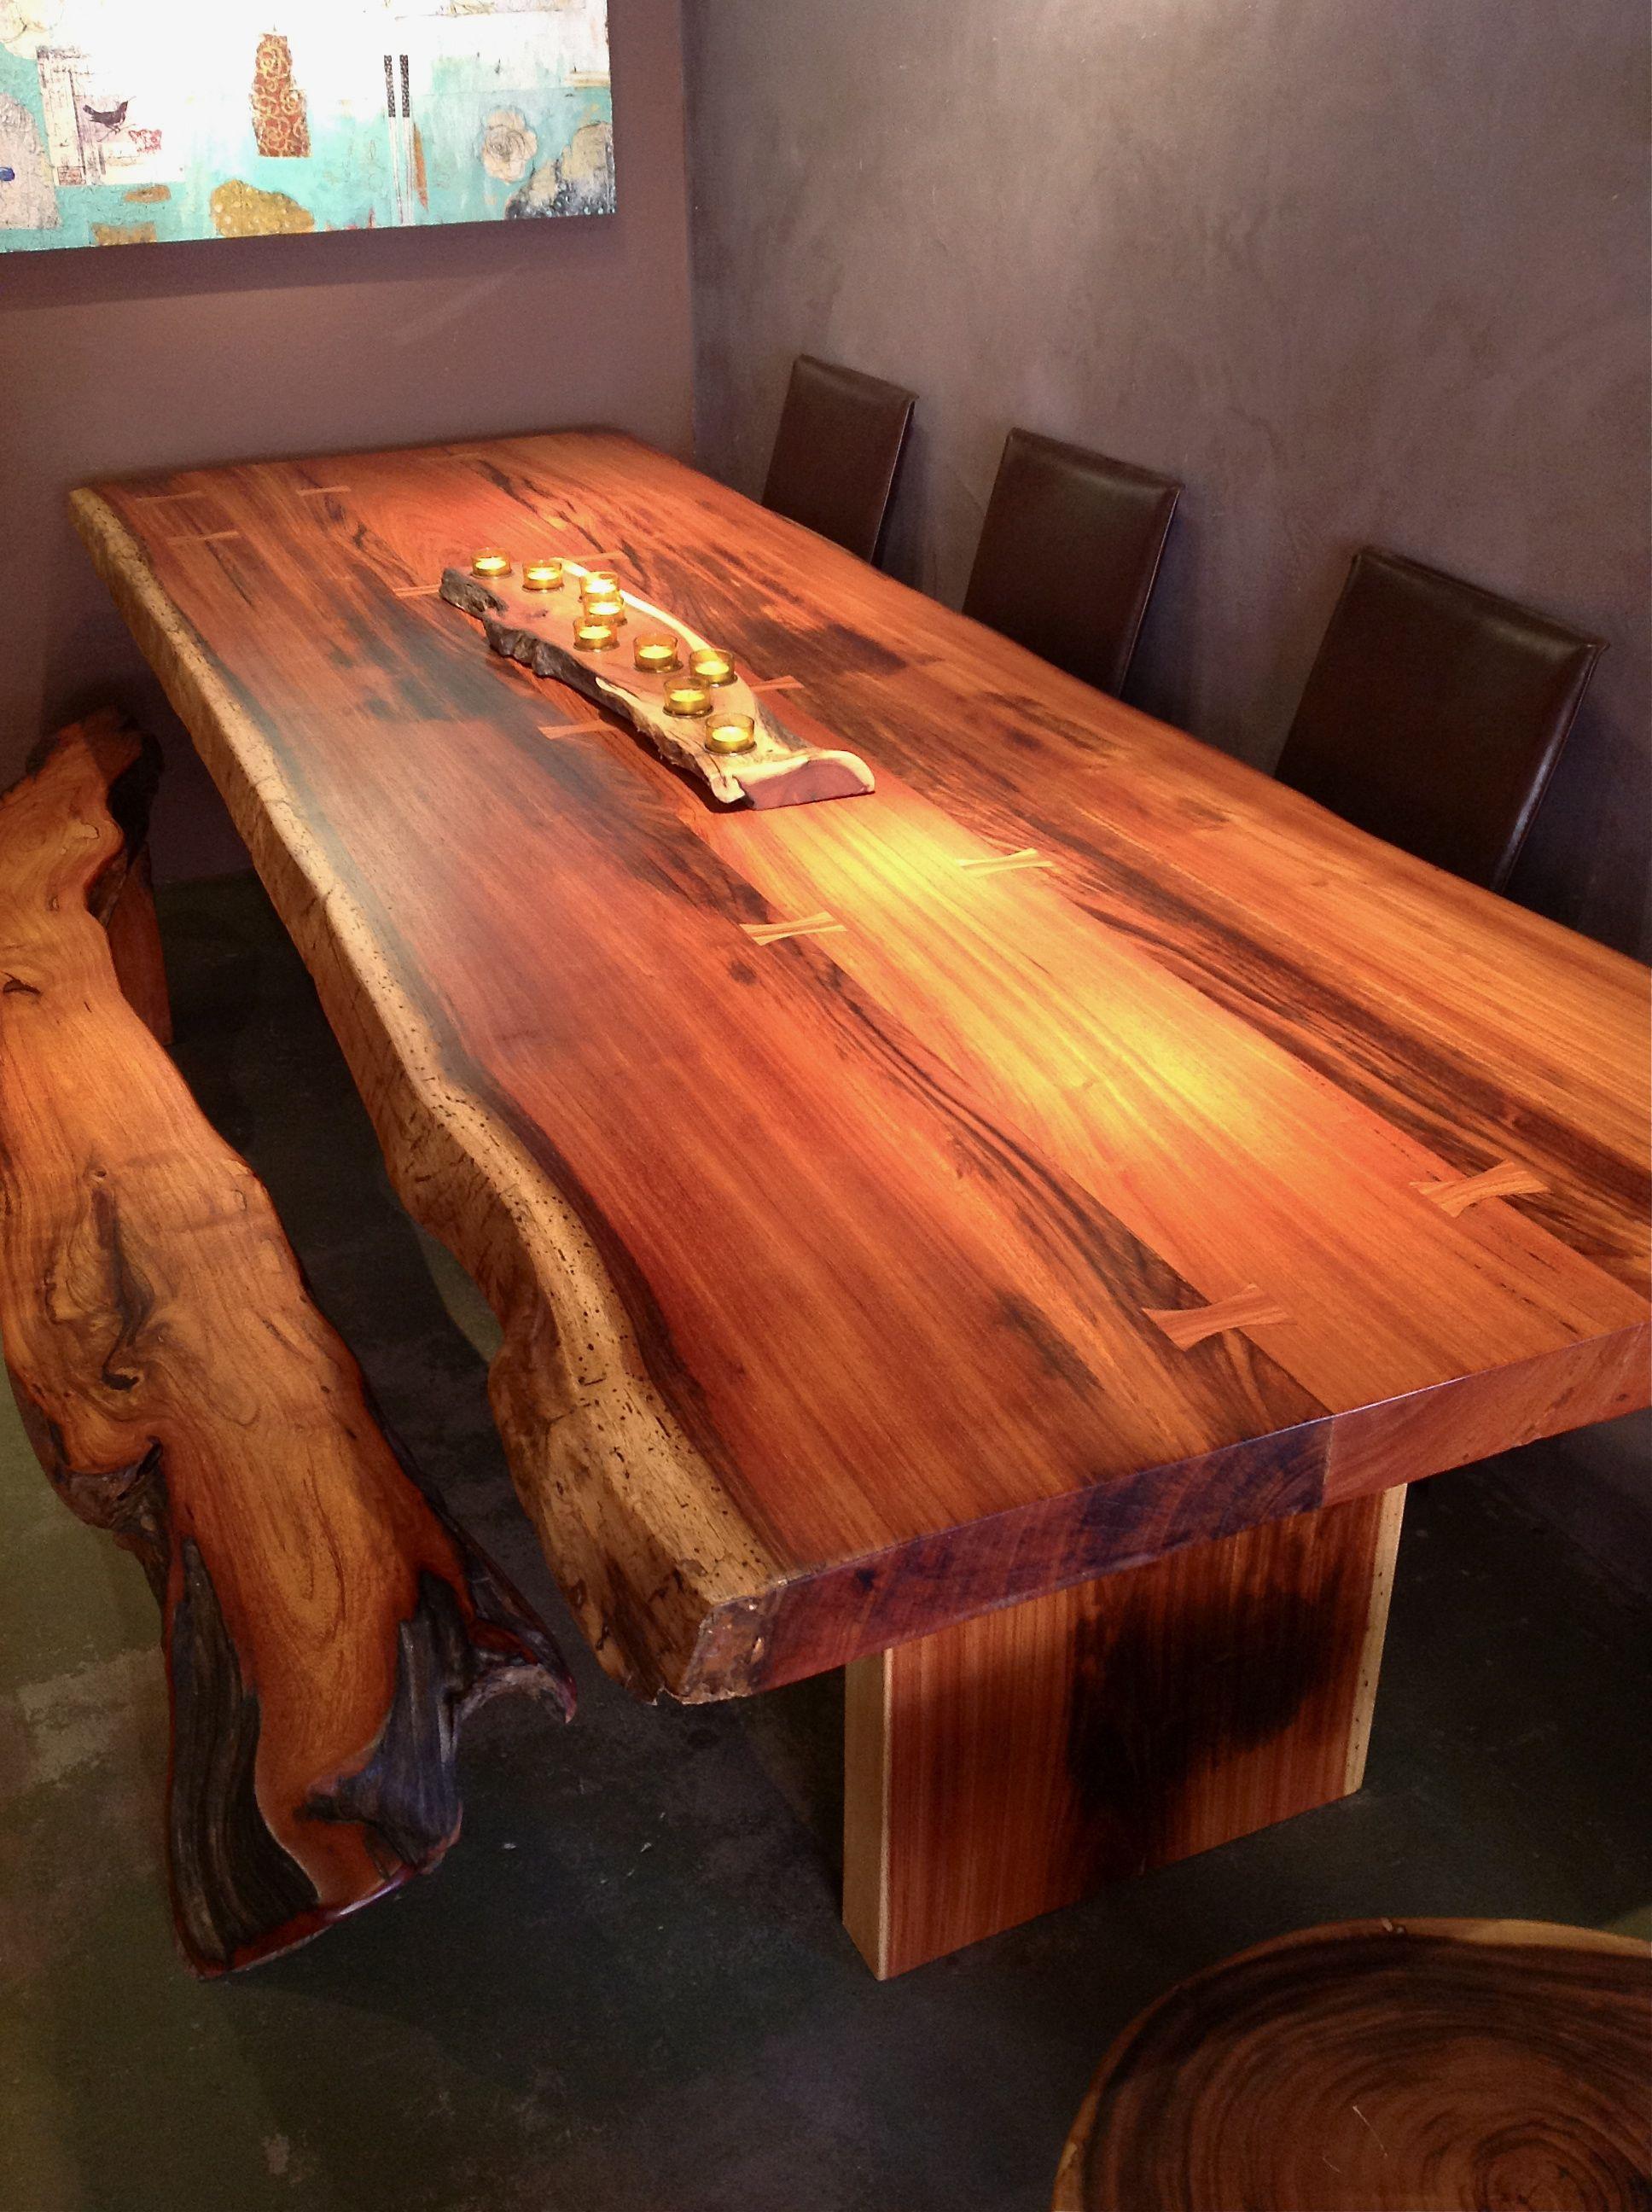 live-edge-dining-table-sequoia-santa-fe | sequoia santa fe, Esszimmer dekoo